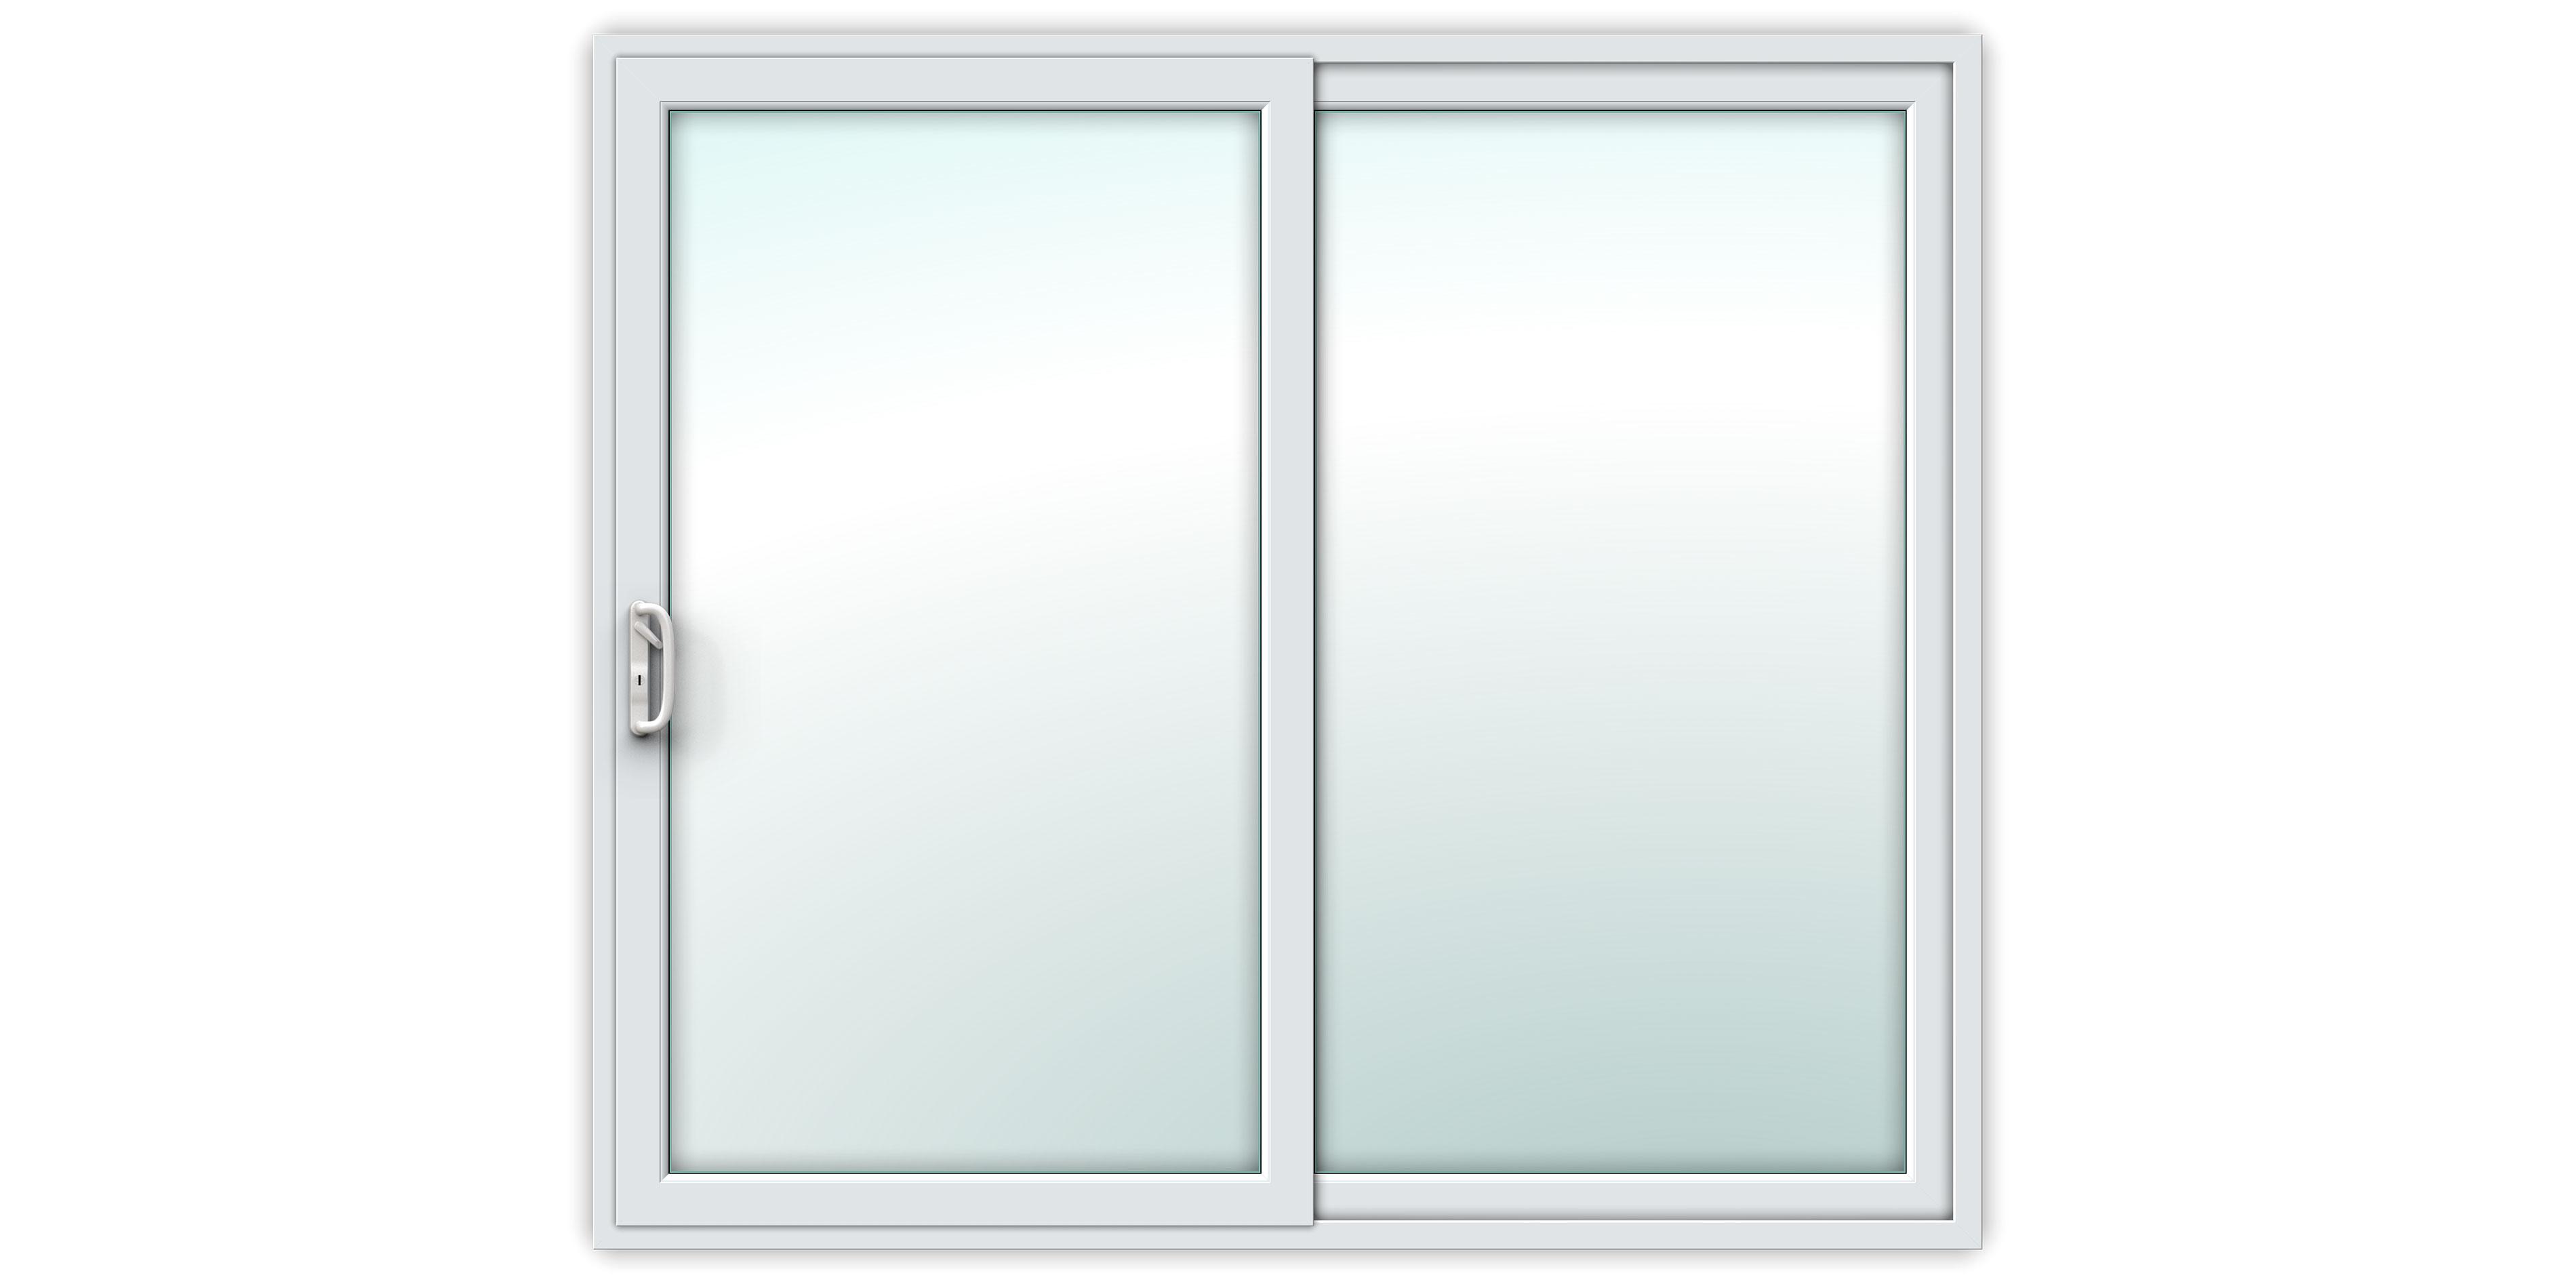 8ft upvc sliding patio doors